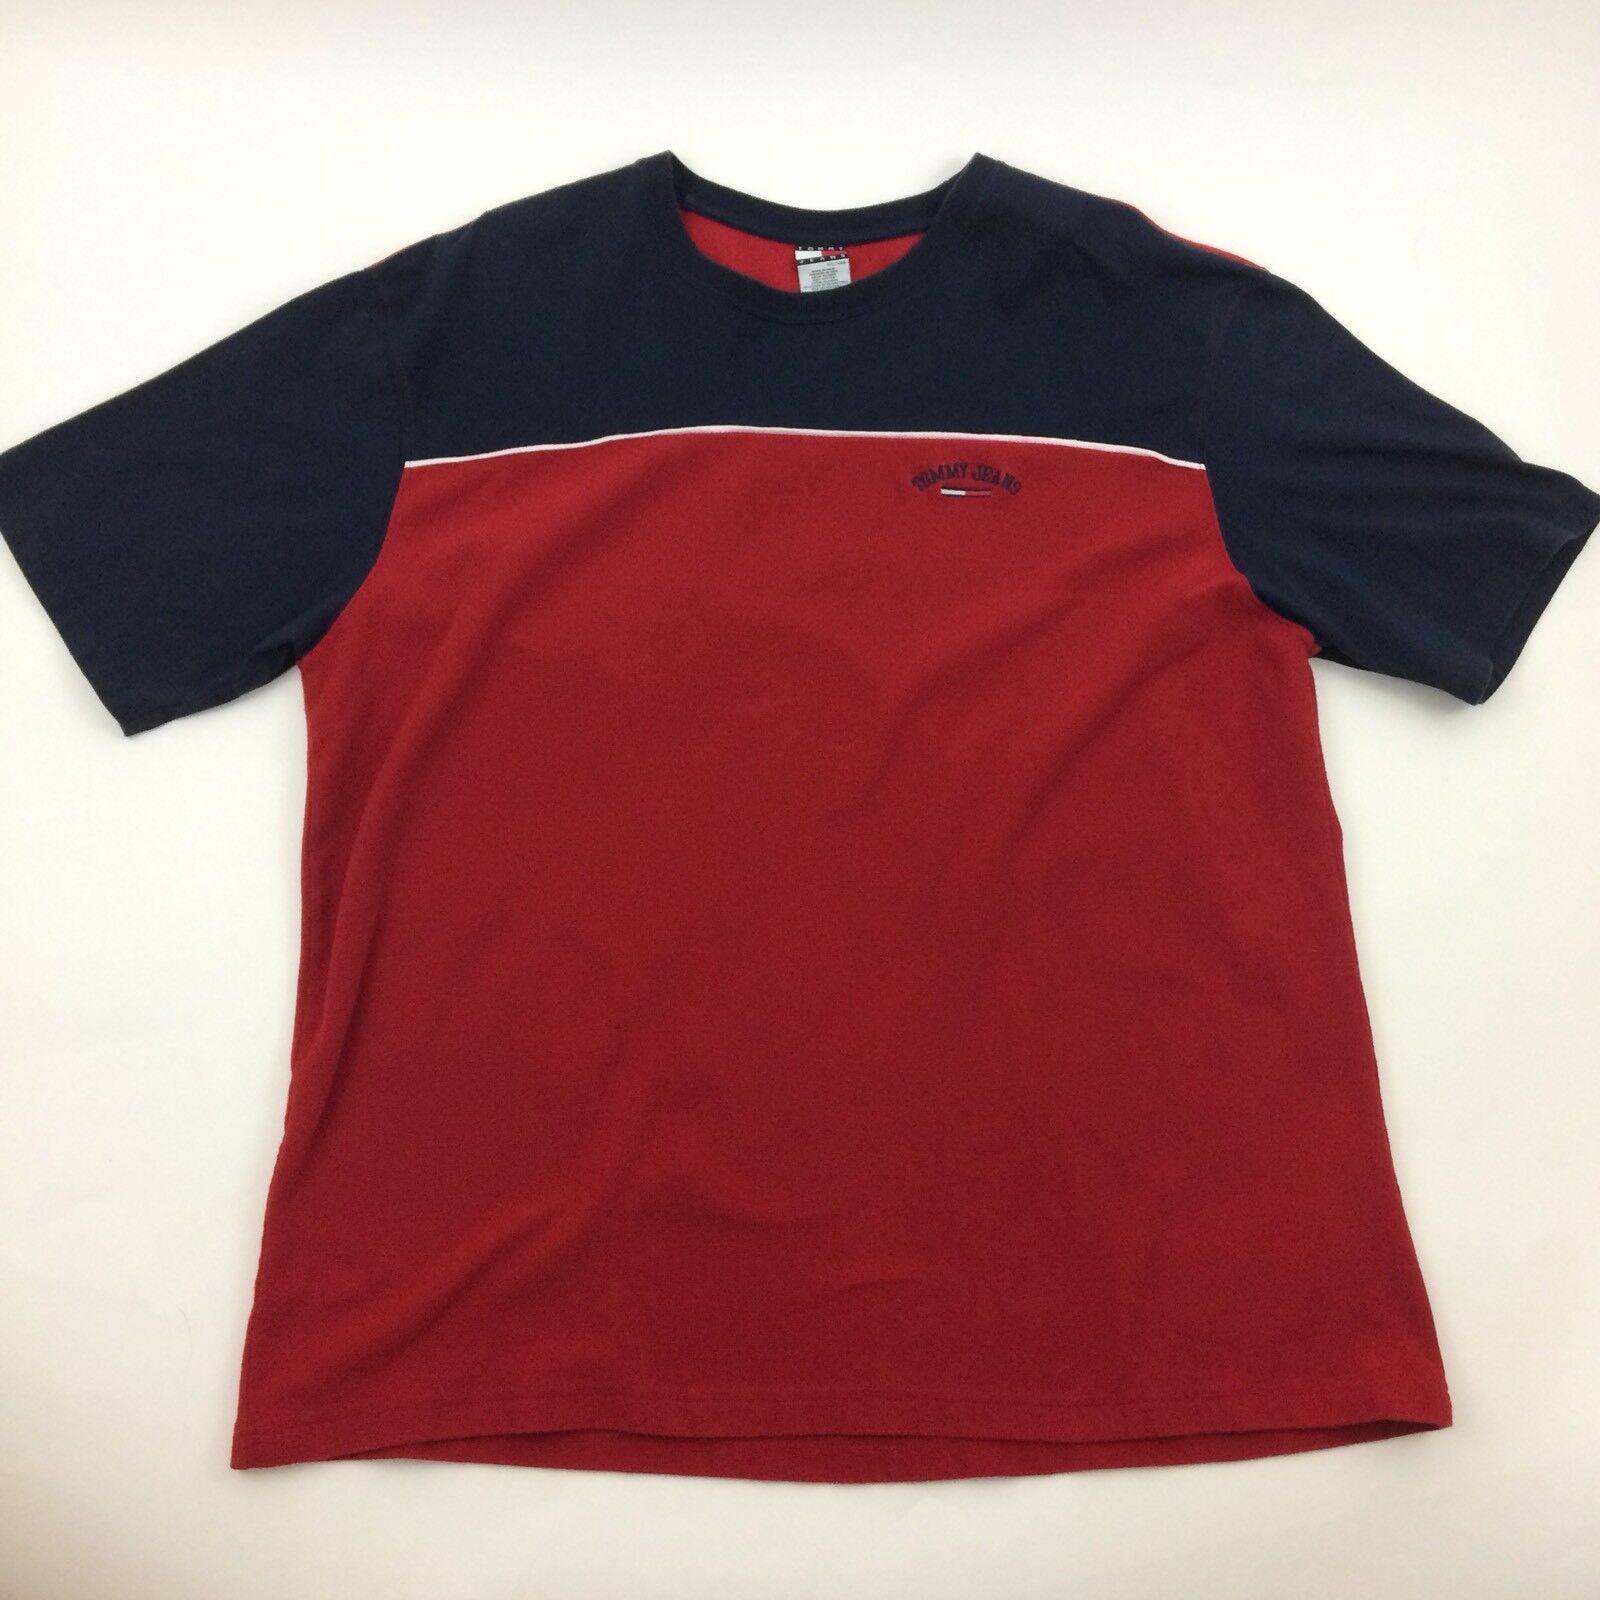 Tommy Hilfiger S/S Knit Shirt Größe XXL Vtg 90s Tommy Jeans Logo ROT Weiß Blau